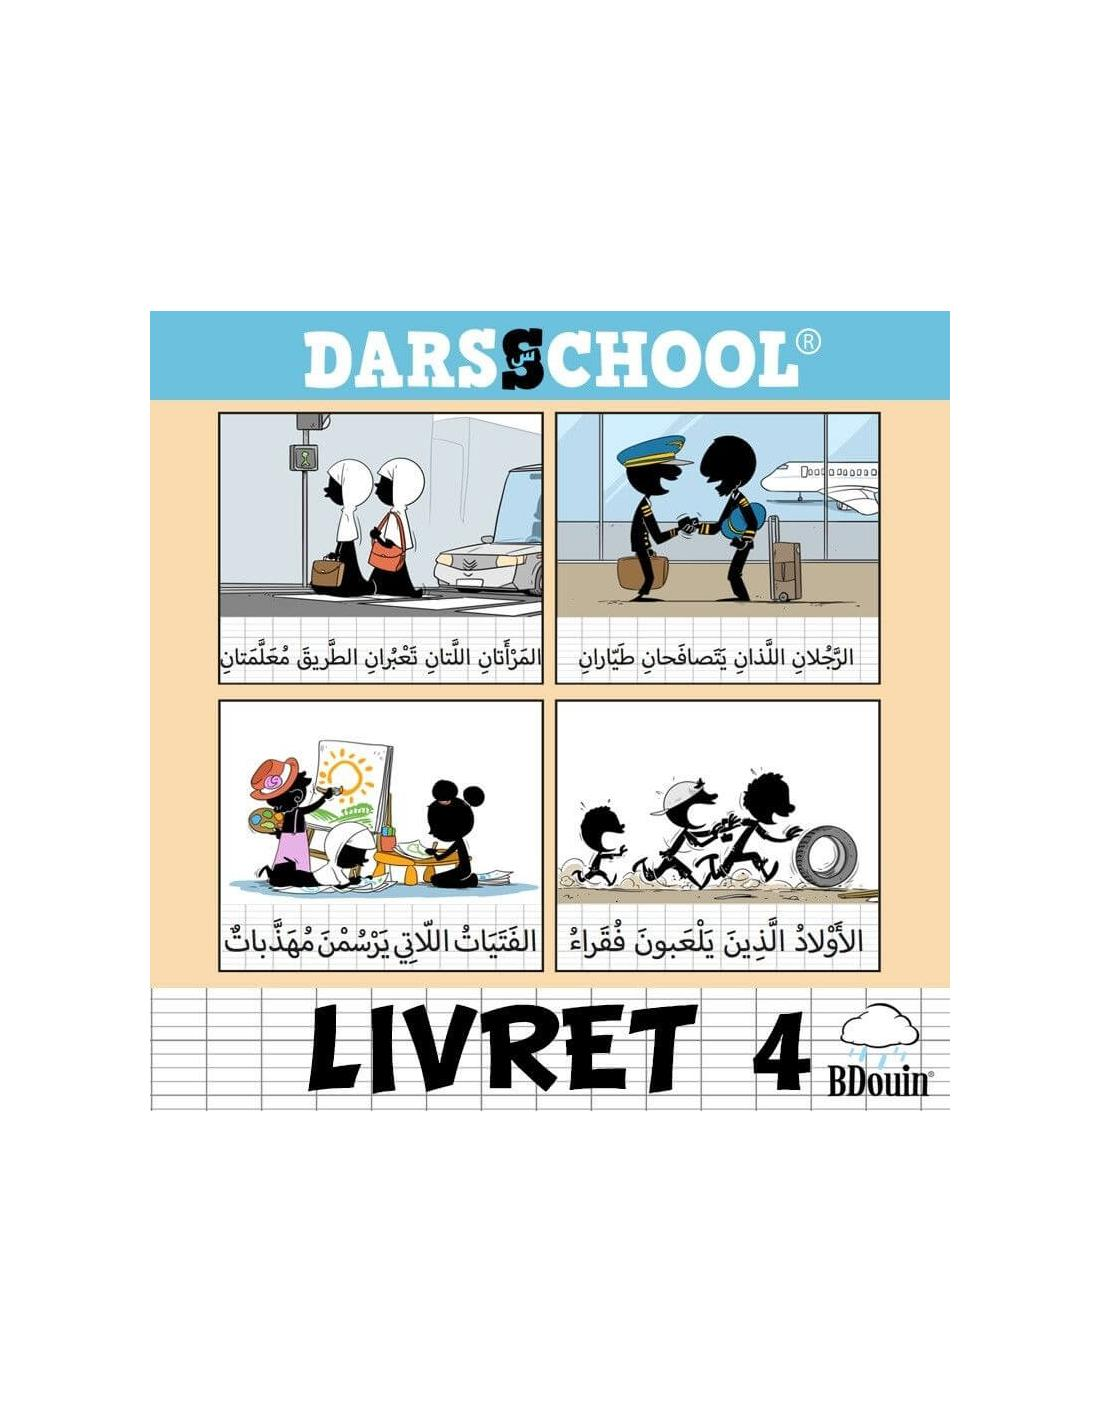 DARSSCHOOL tome de medine pdf  - Livre 4